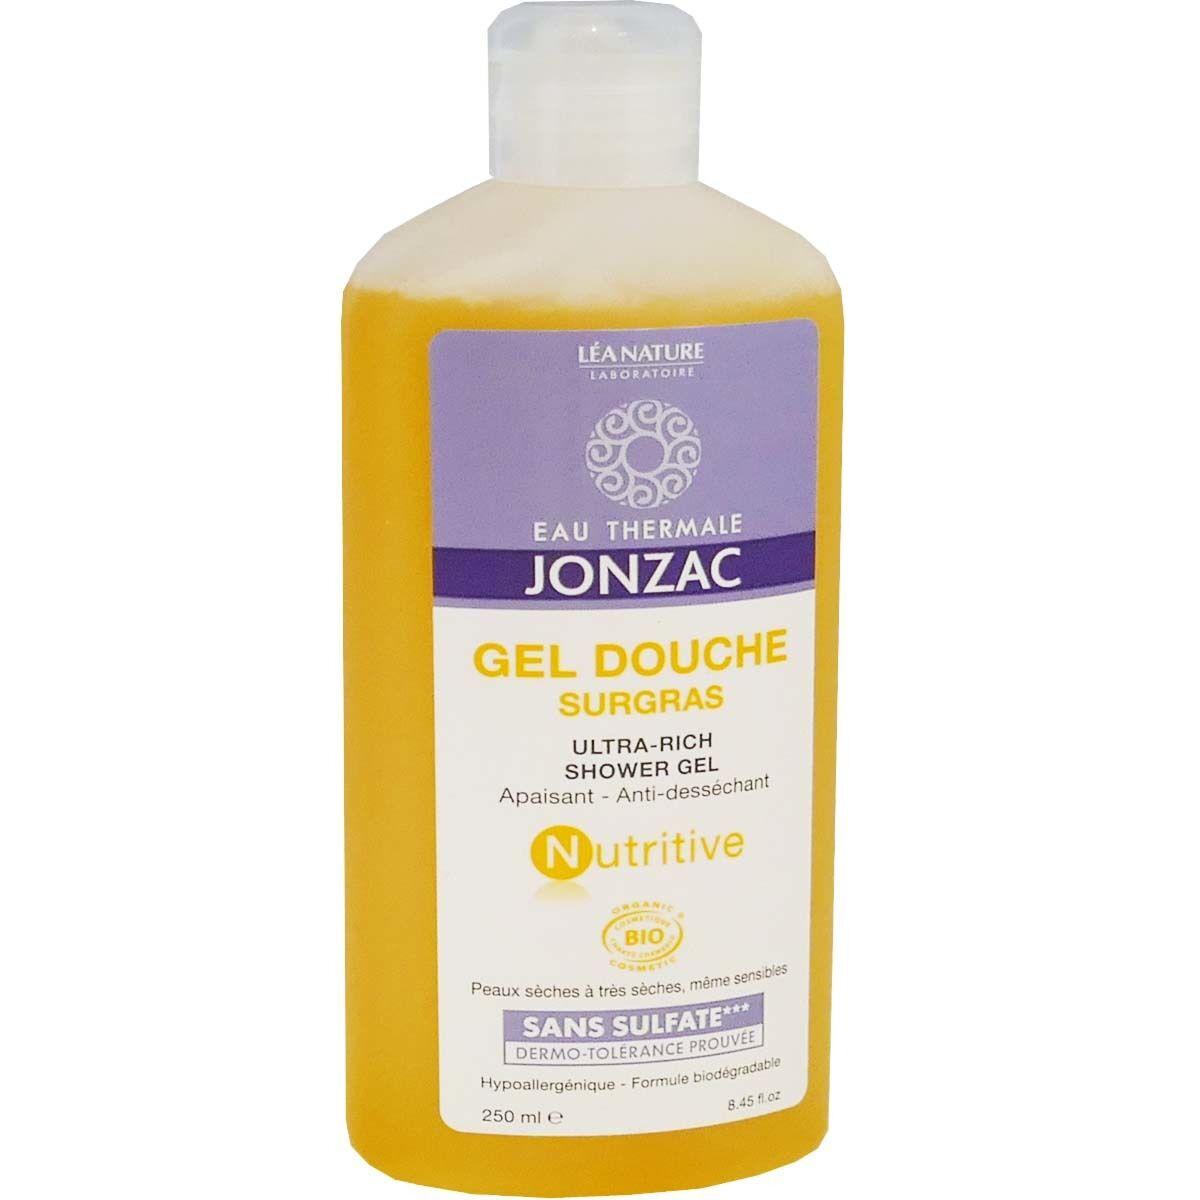 Jonzac gel douche surgras nutritive bio 250 ml